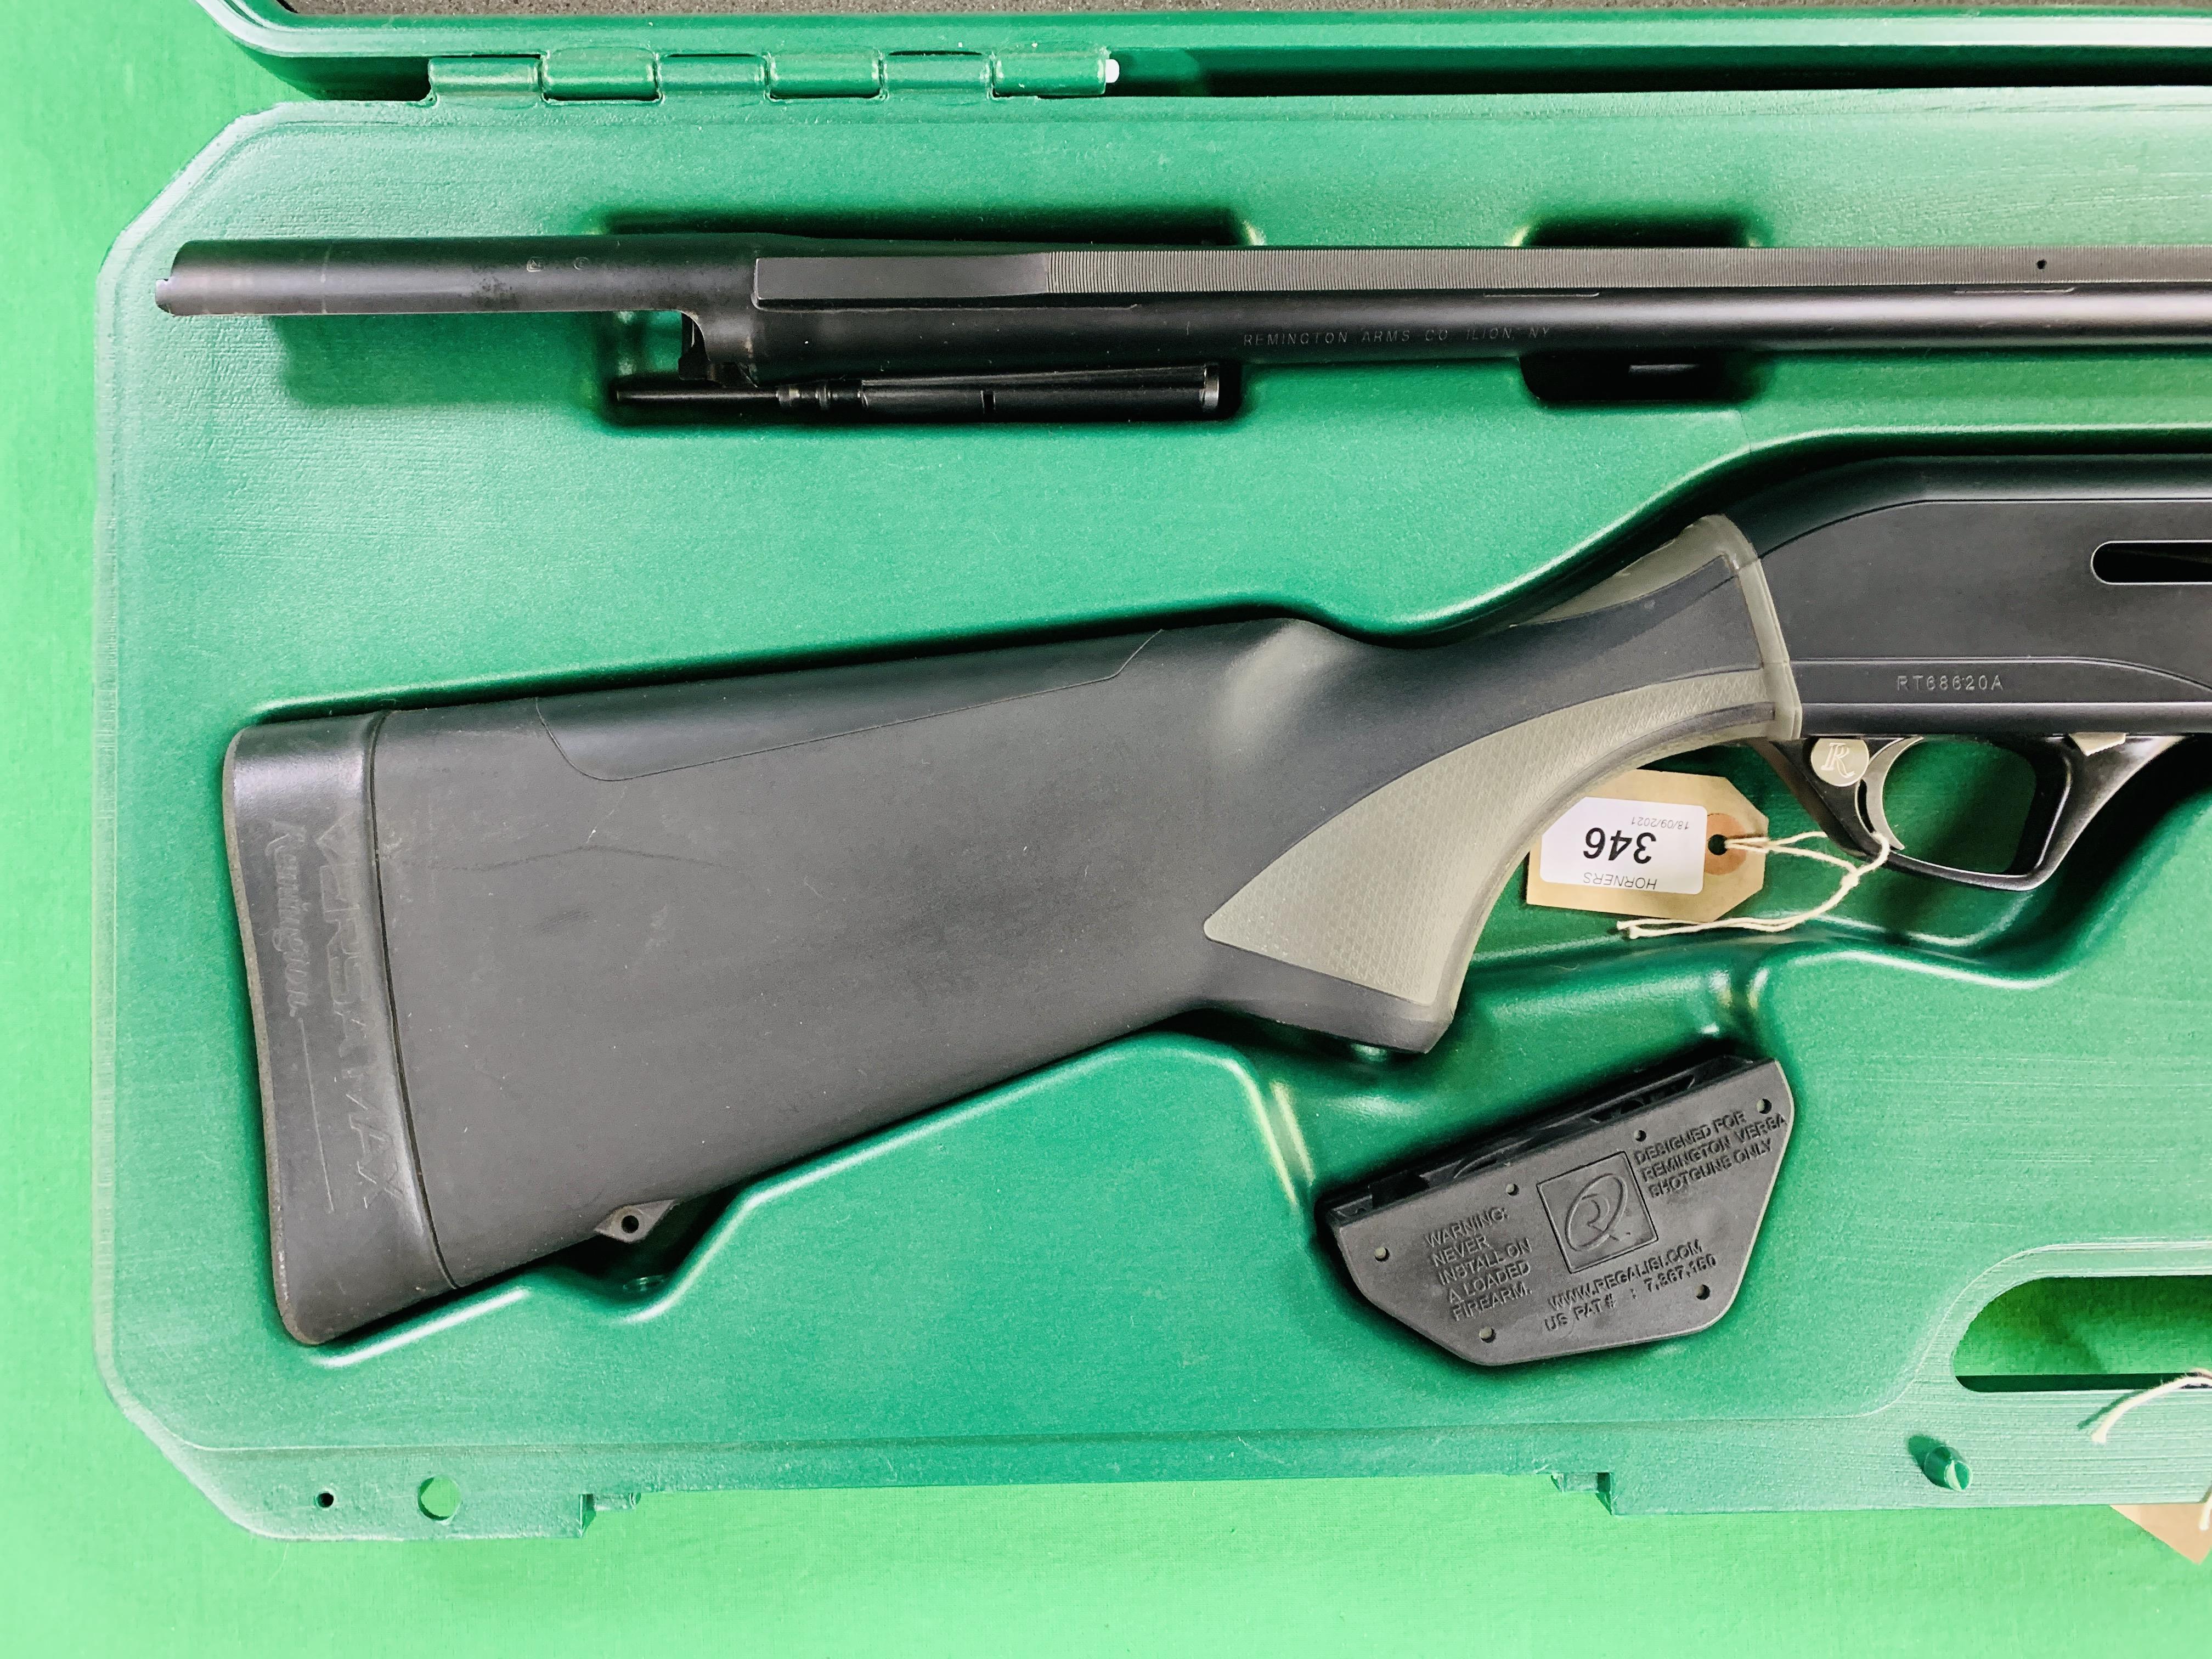 REMINGTON VERSA MAX 12 GAUGE SEMI-AUTO SHOTGUN 2¾ - 3½ CHOKE, - Image 2 of 13